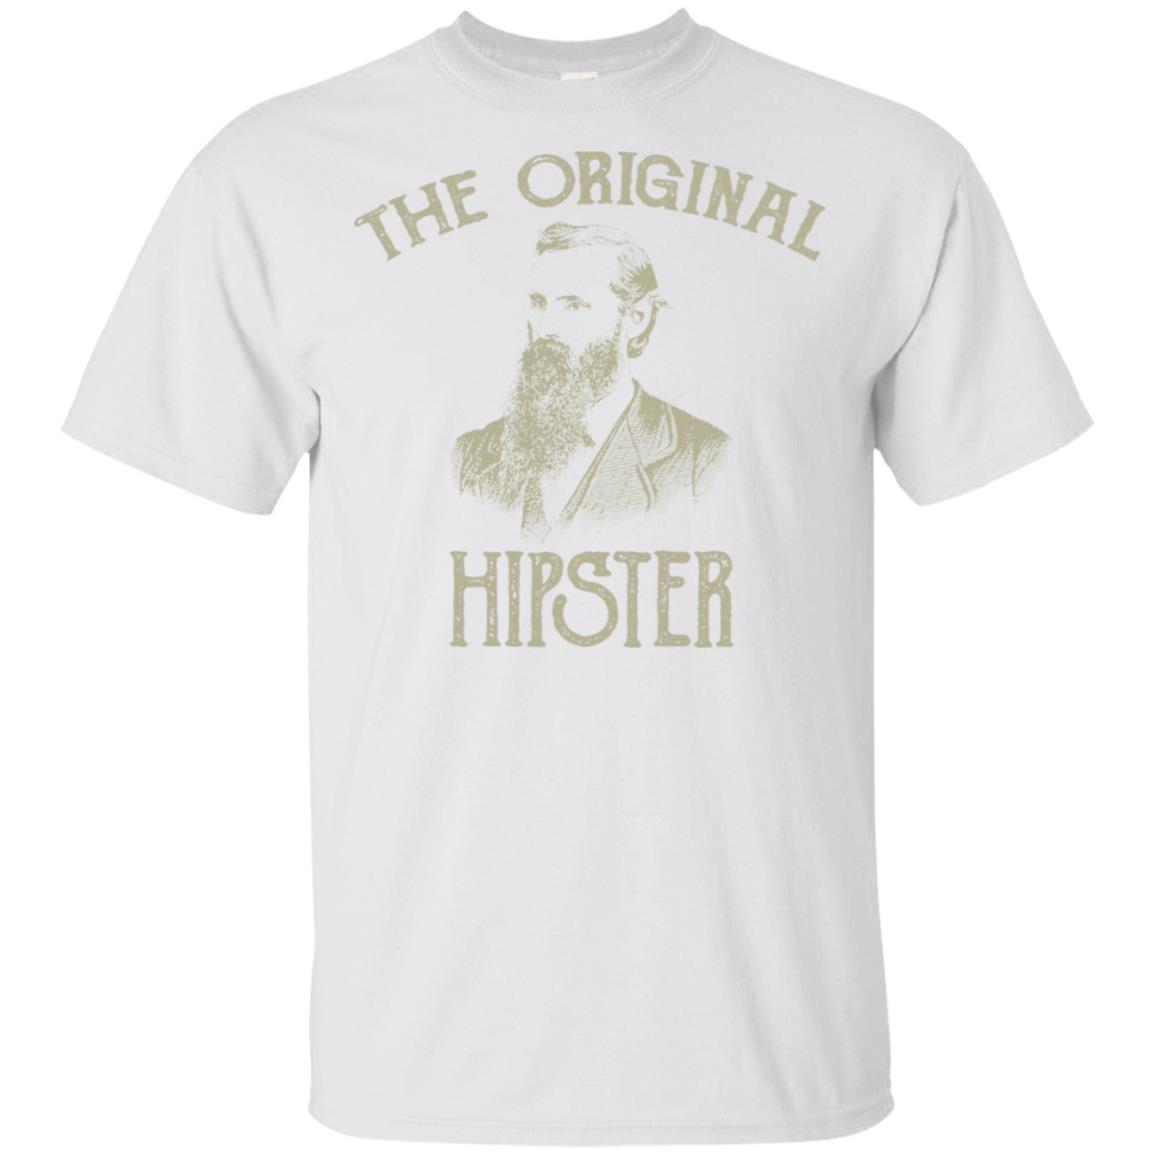 Hipster Retro Vintage Distressed Beard Design Unisex Short Sleeve